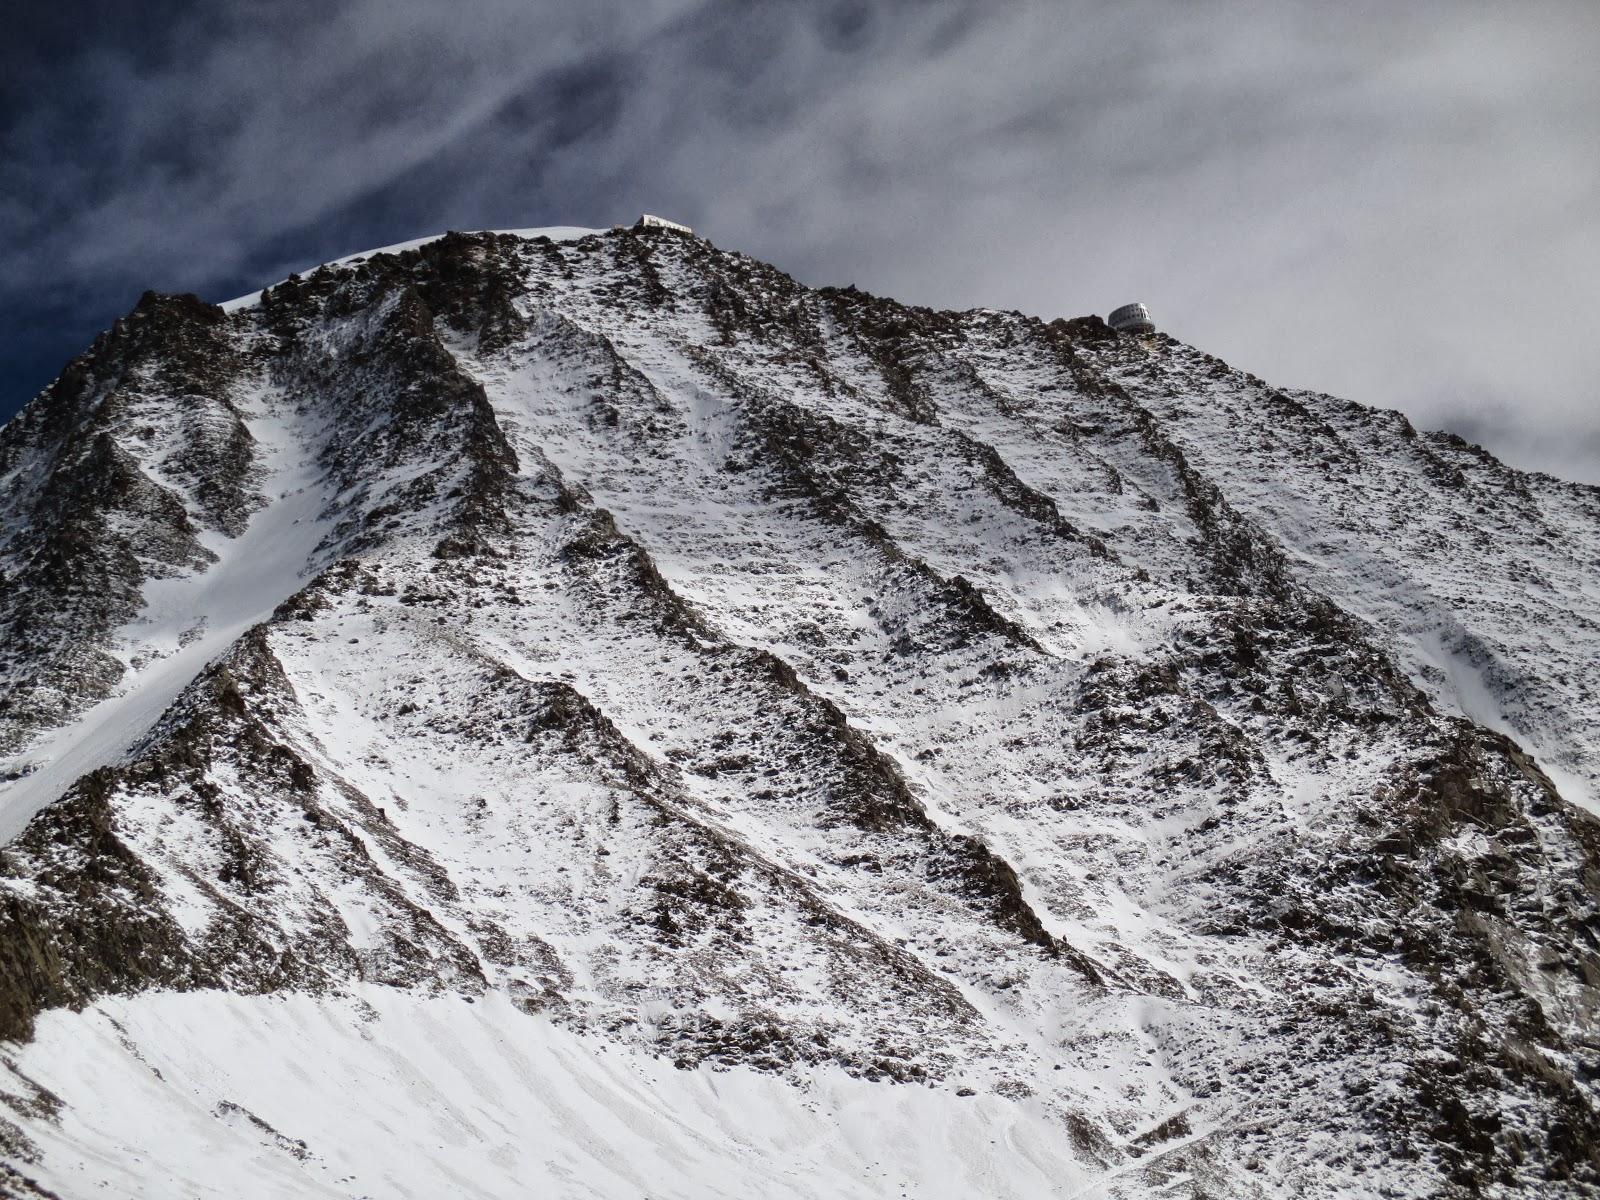 5a5c7706a30 Mont Blanc (4807m) Ruta de Gouter.Alpes-Chamonix - Martín Elorza